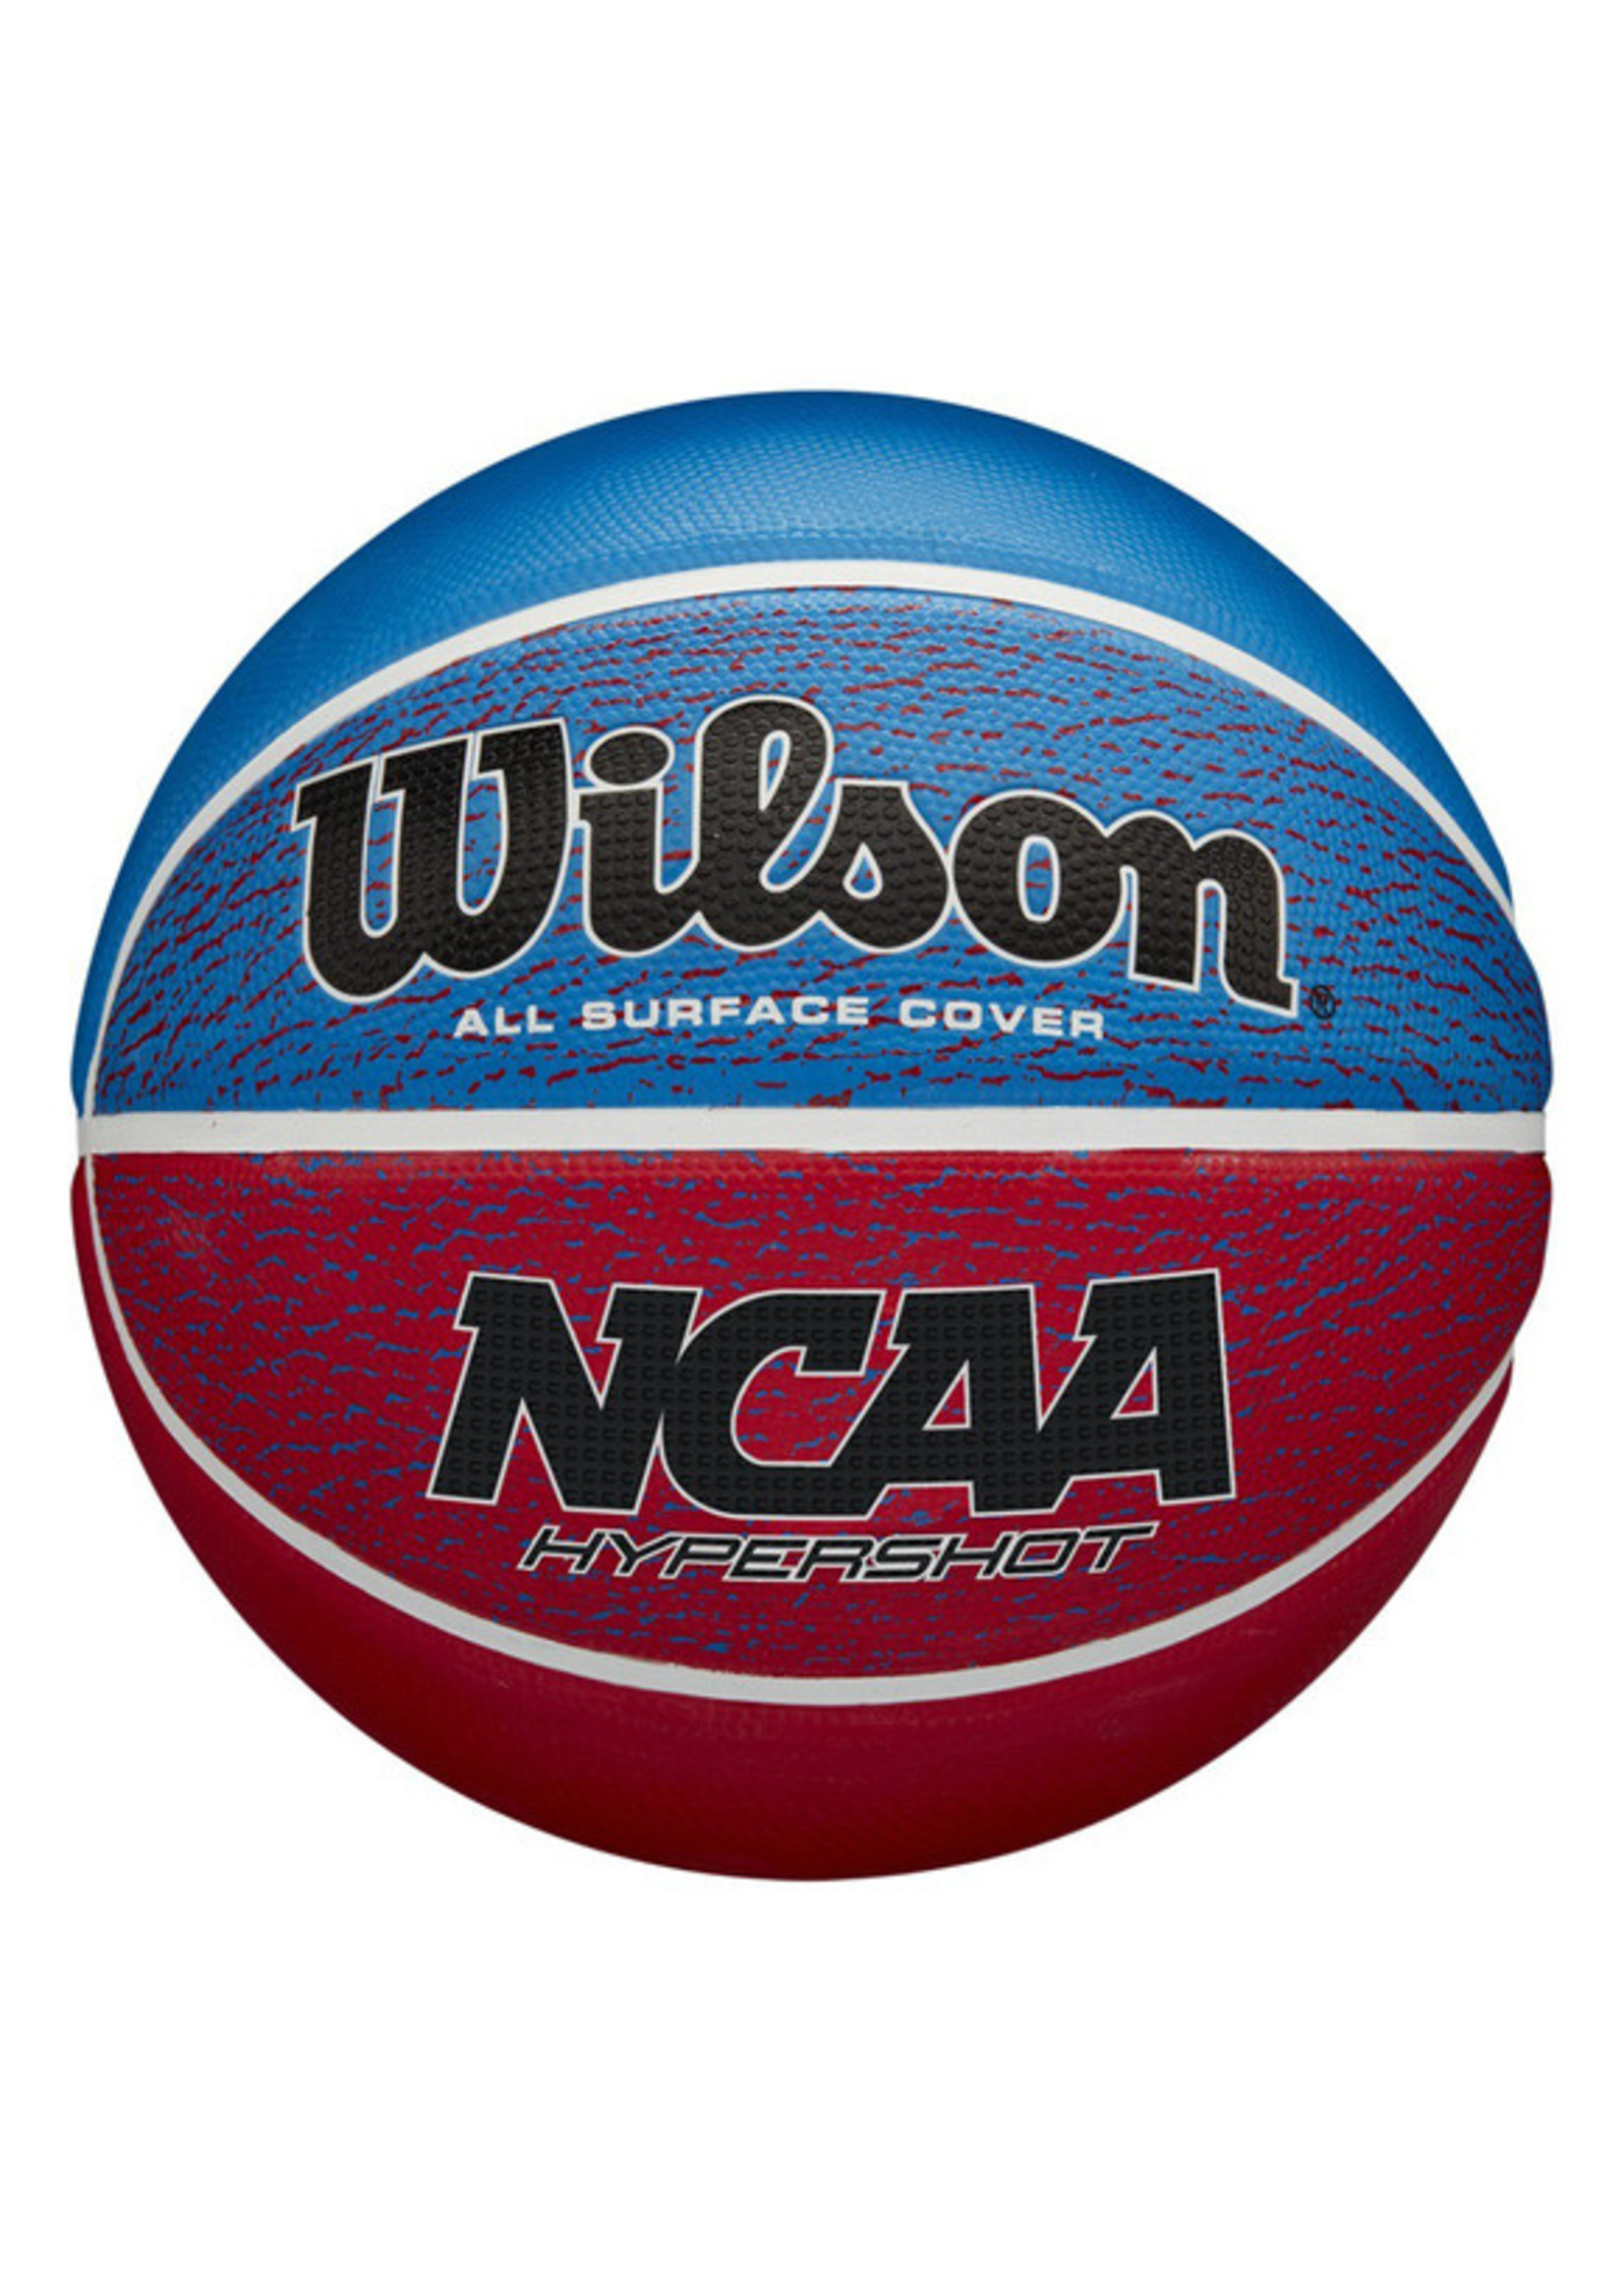 "WILSON WILSON BALLON NCAA HYPERSHOT II BSKT RWB 29.5"""